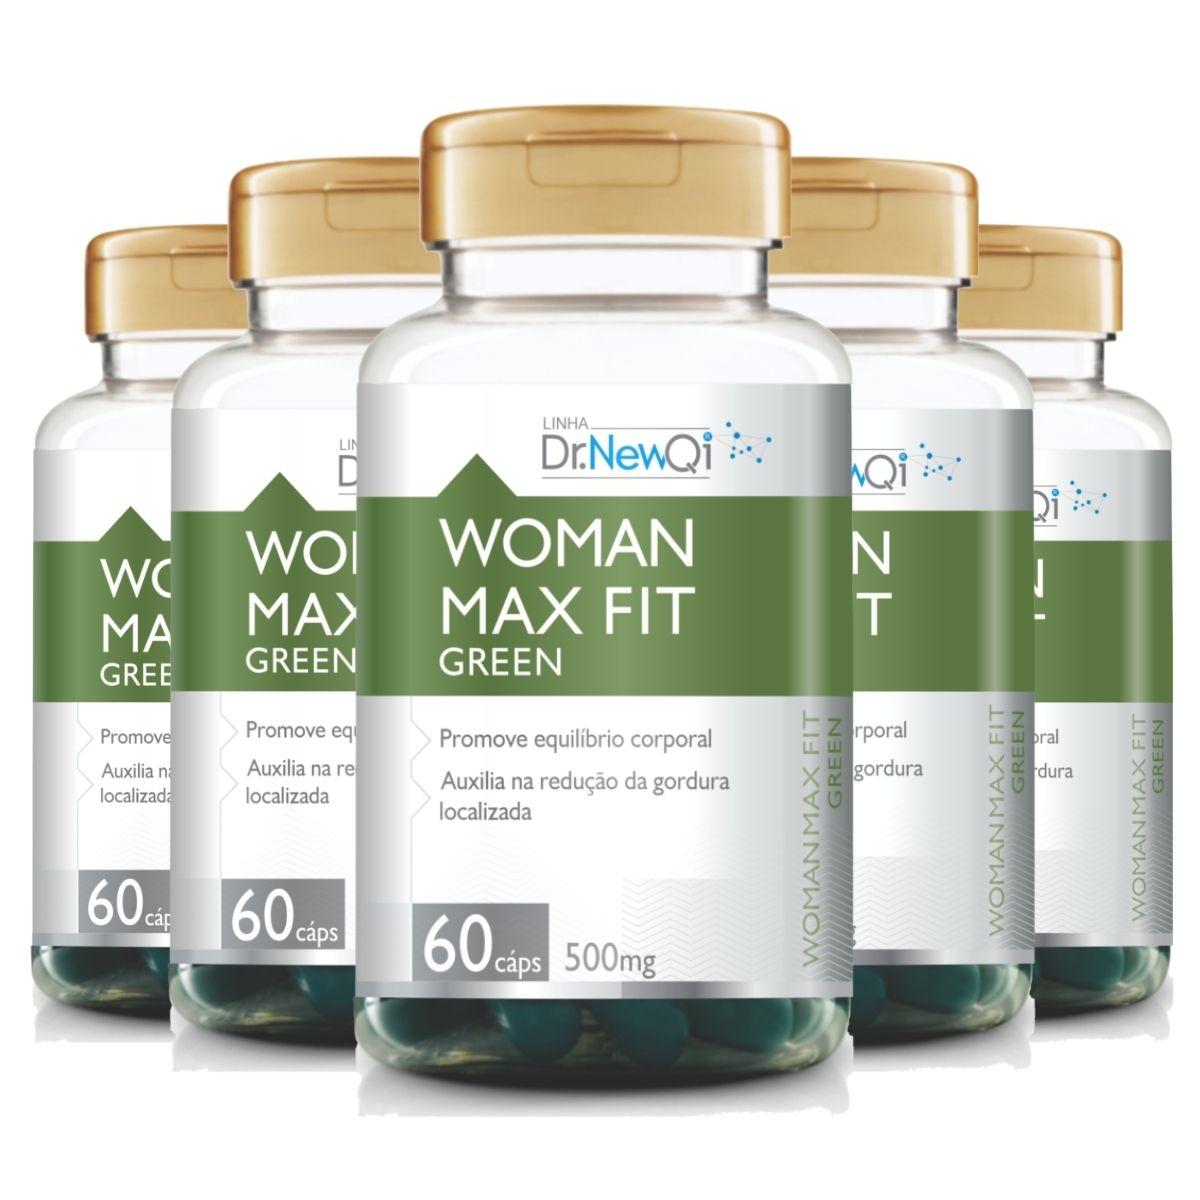 Kit 5 Woman Max Fit Green 60 Cápsulas 500mg Dr. New QI - UpNutri